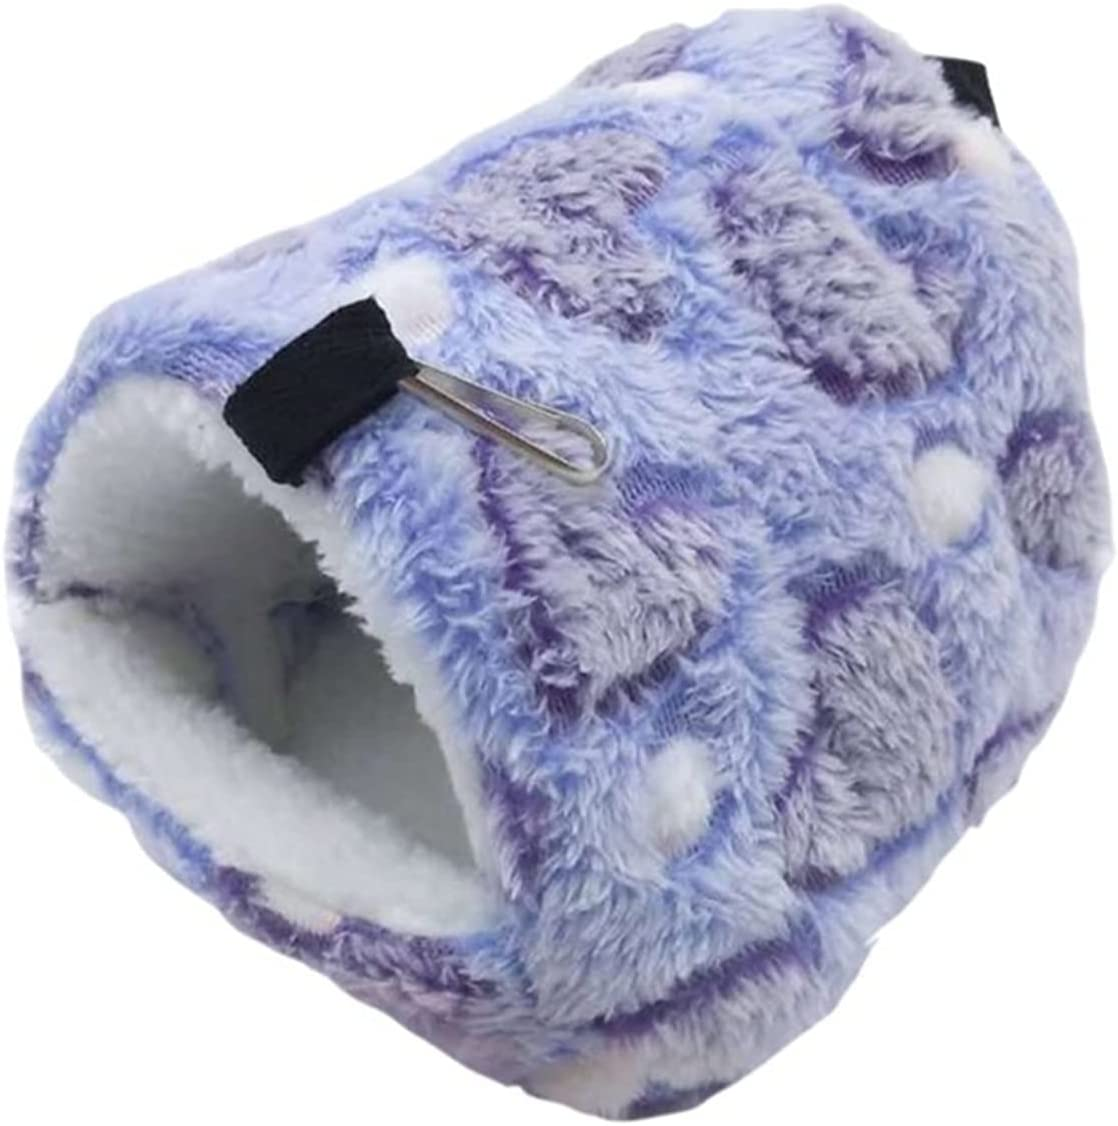 OMYLFQ Cat Hammock Bed Cute Small Hamster Parrot Max 73% OFF C Soft 40% OFF Cheap Sale Bird Pet